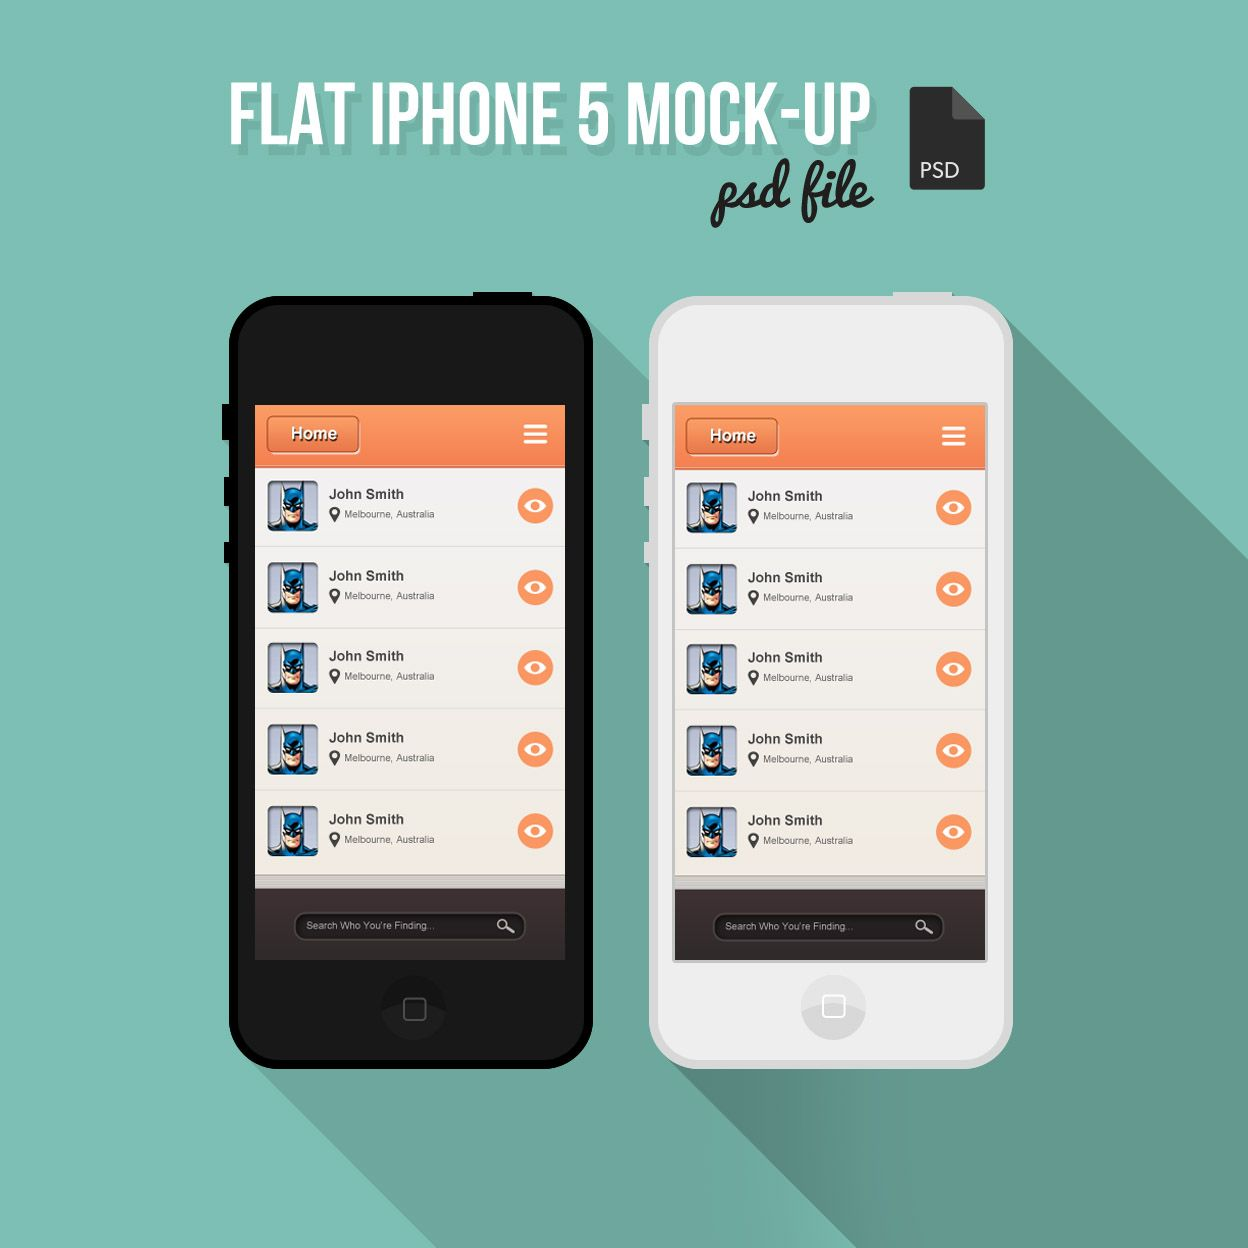 free flat iphone 5 mock up psd - Iphone 5s Mockup Free